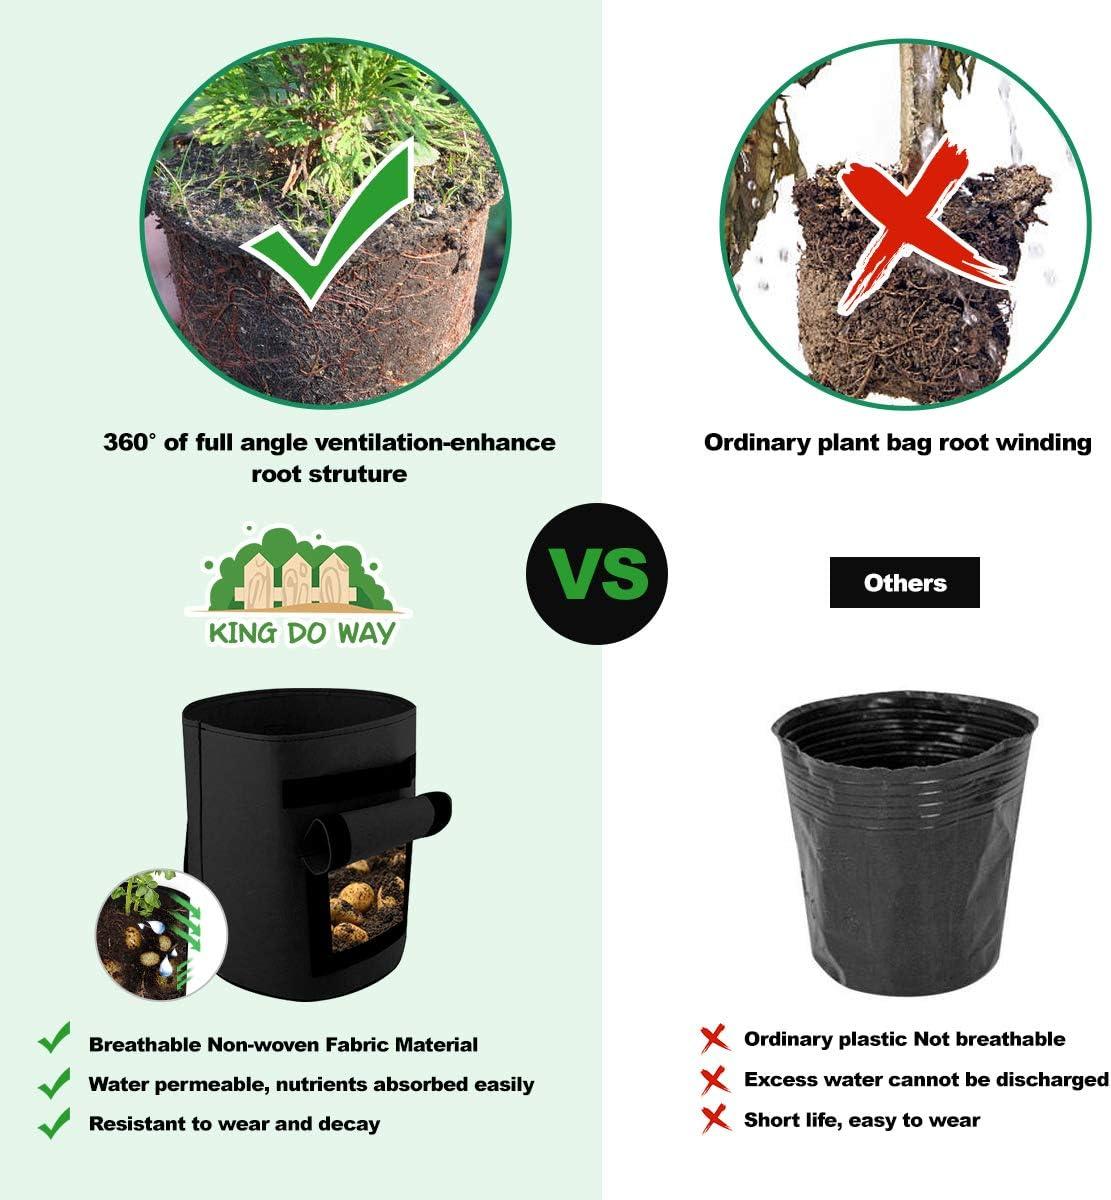 king do way Potato Grow Bags 2 Pack Plant Growing Bags Garden Vegetable Growing Bags Pots Plant Bags Potato Planting Bag with 2 Window Flaps and Handles for Potato,Tomato,Carrot